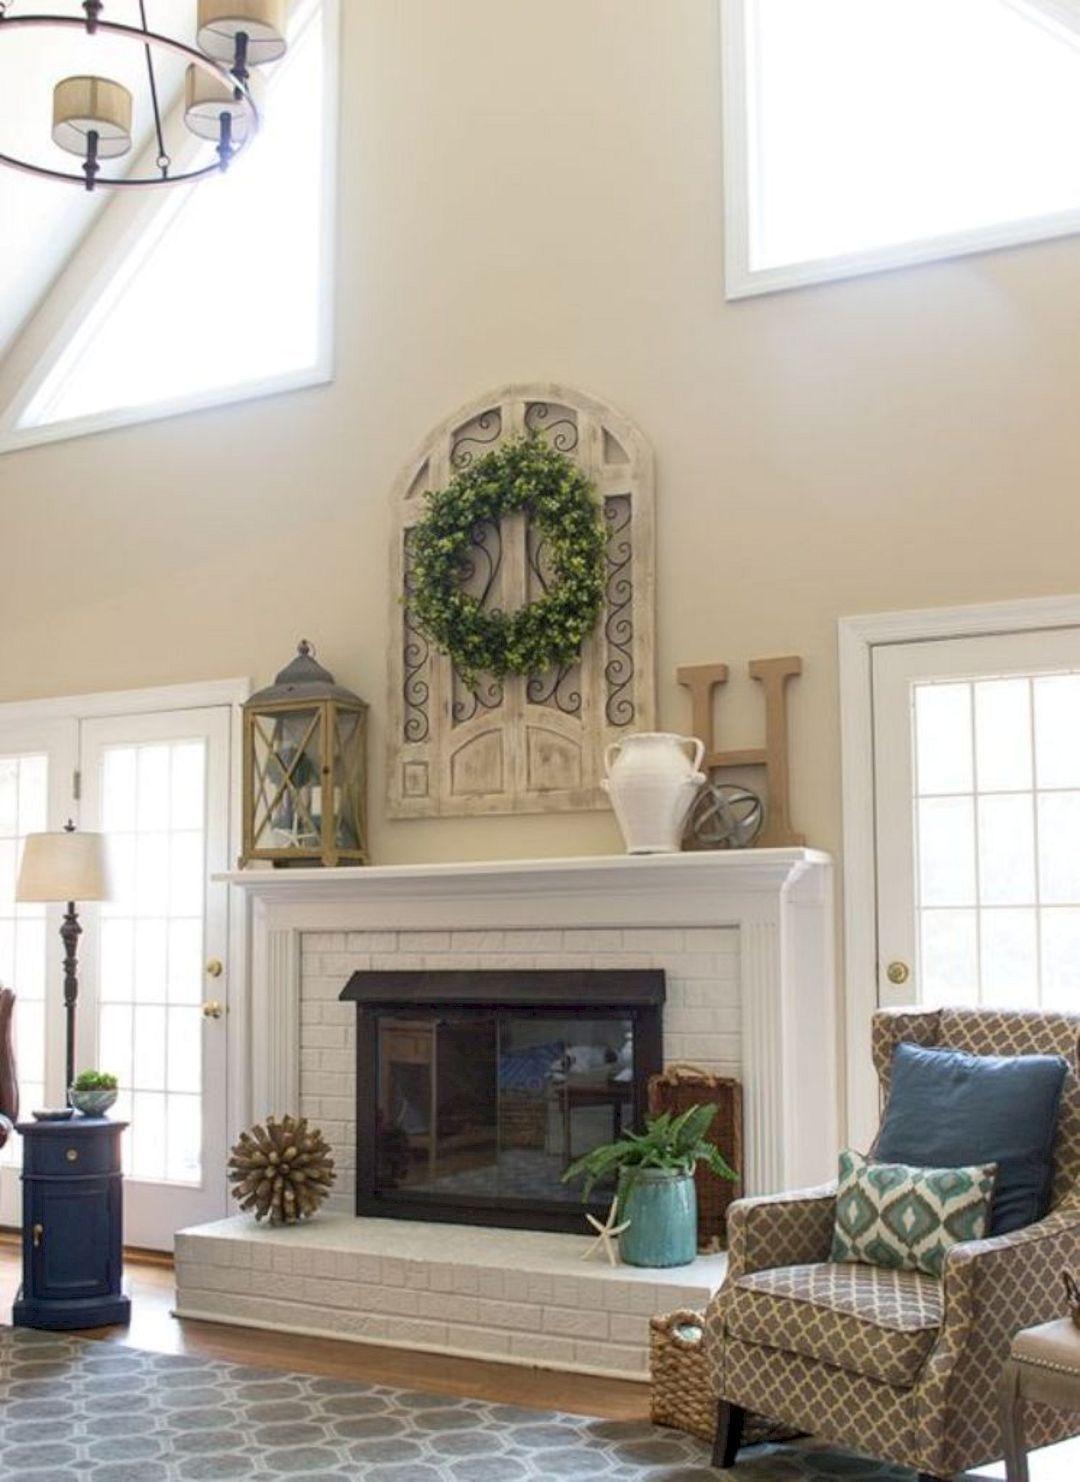 16 Fireplace Mantel Decorating Ideas Fireplace Mantel Decor Fireplace Mantle Decor Fireplace Decor